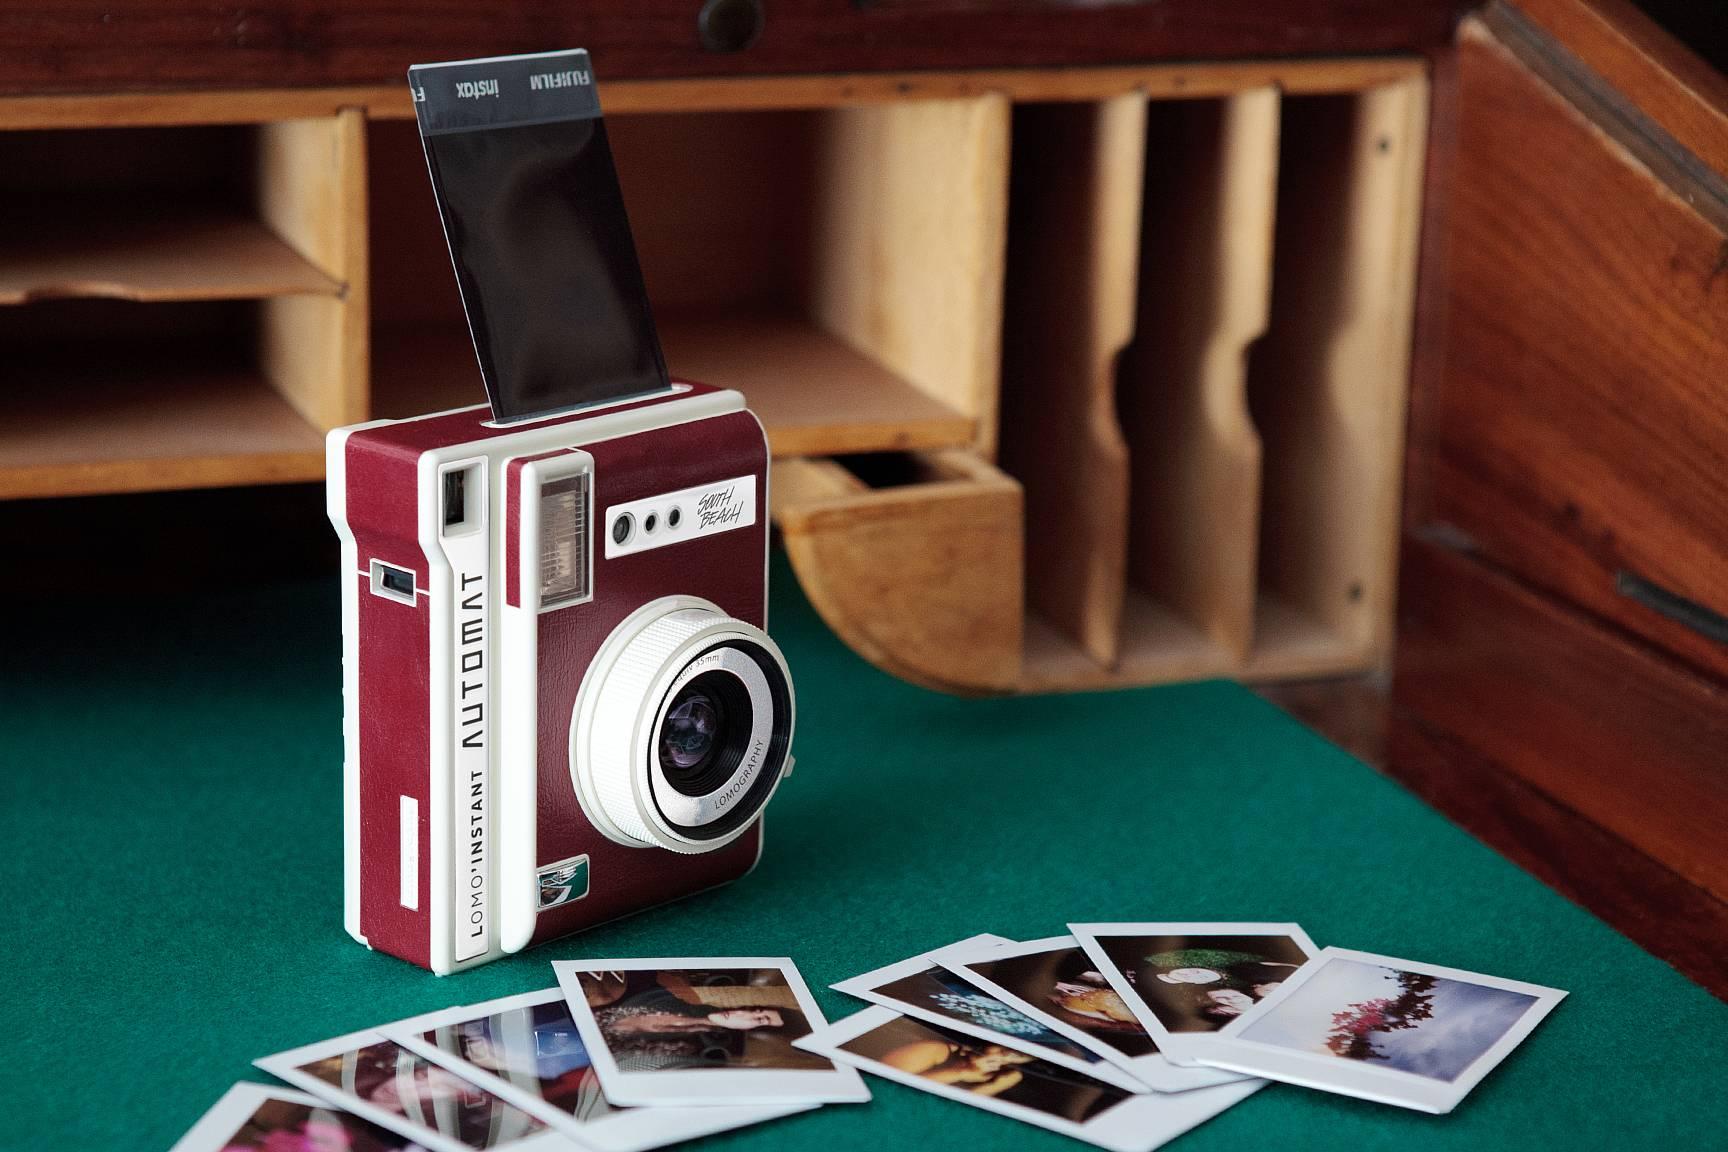 tendencias - camaras fotograficas lomo - lomography